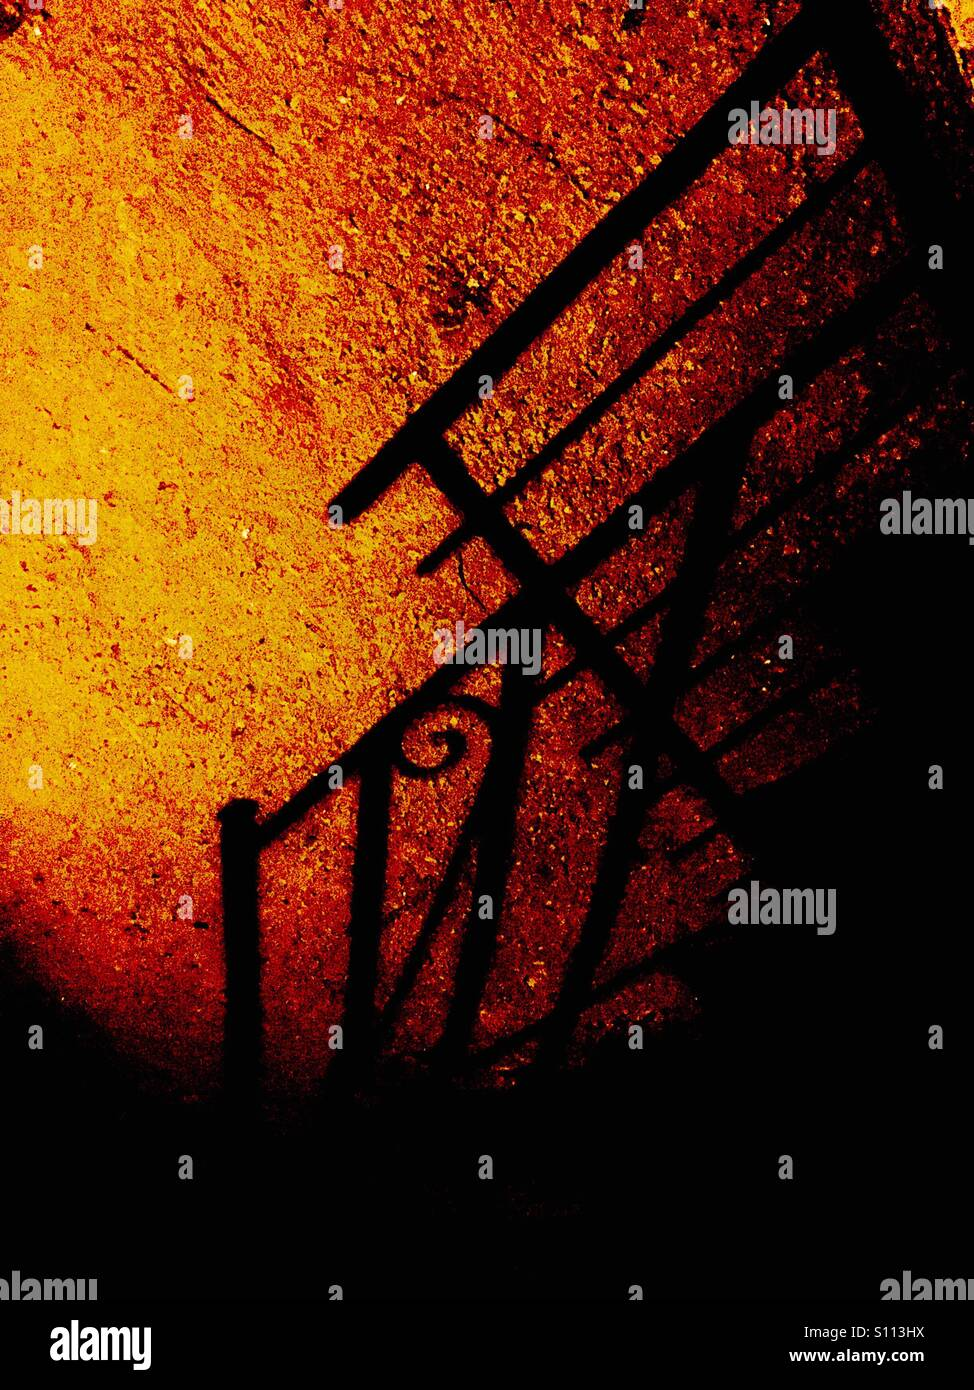 Fence shadow and orange light - Stock Image